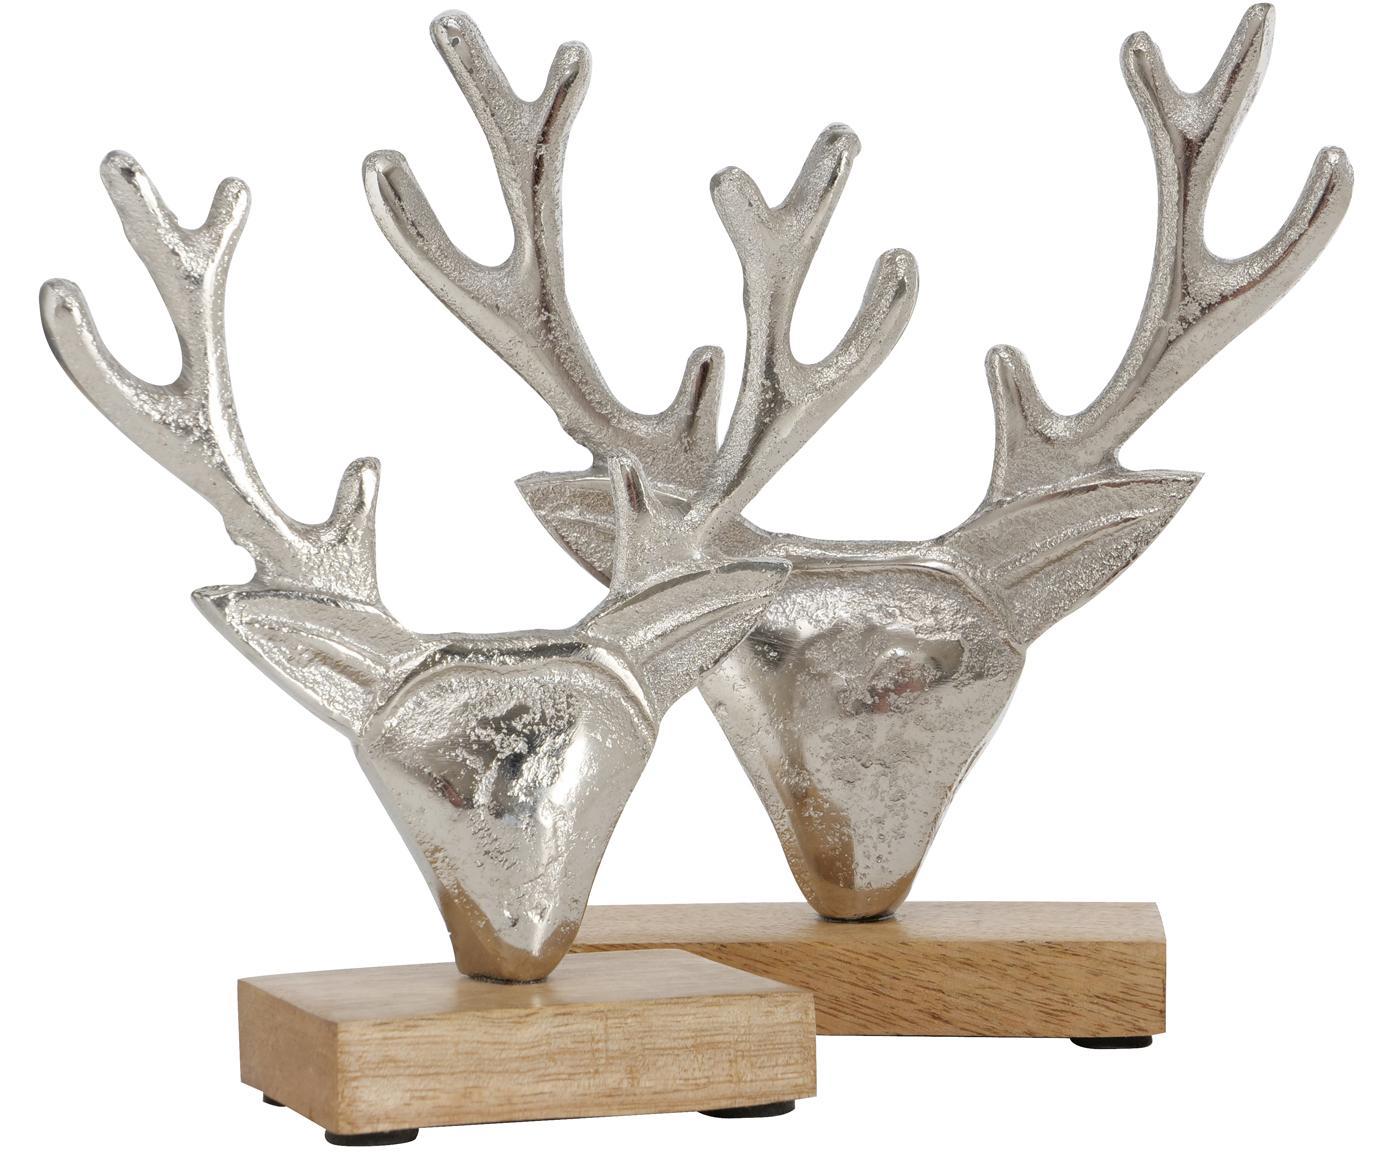 Komplet dekoracji Harribert, 2 elem., Drewno mangowe, aluminium, Drewno mangowe, aluminium, Różne rozmiary